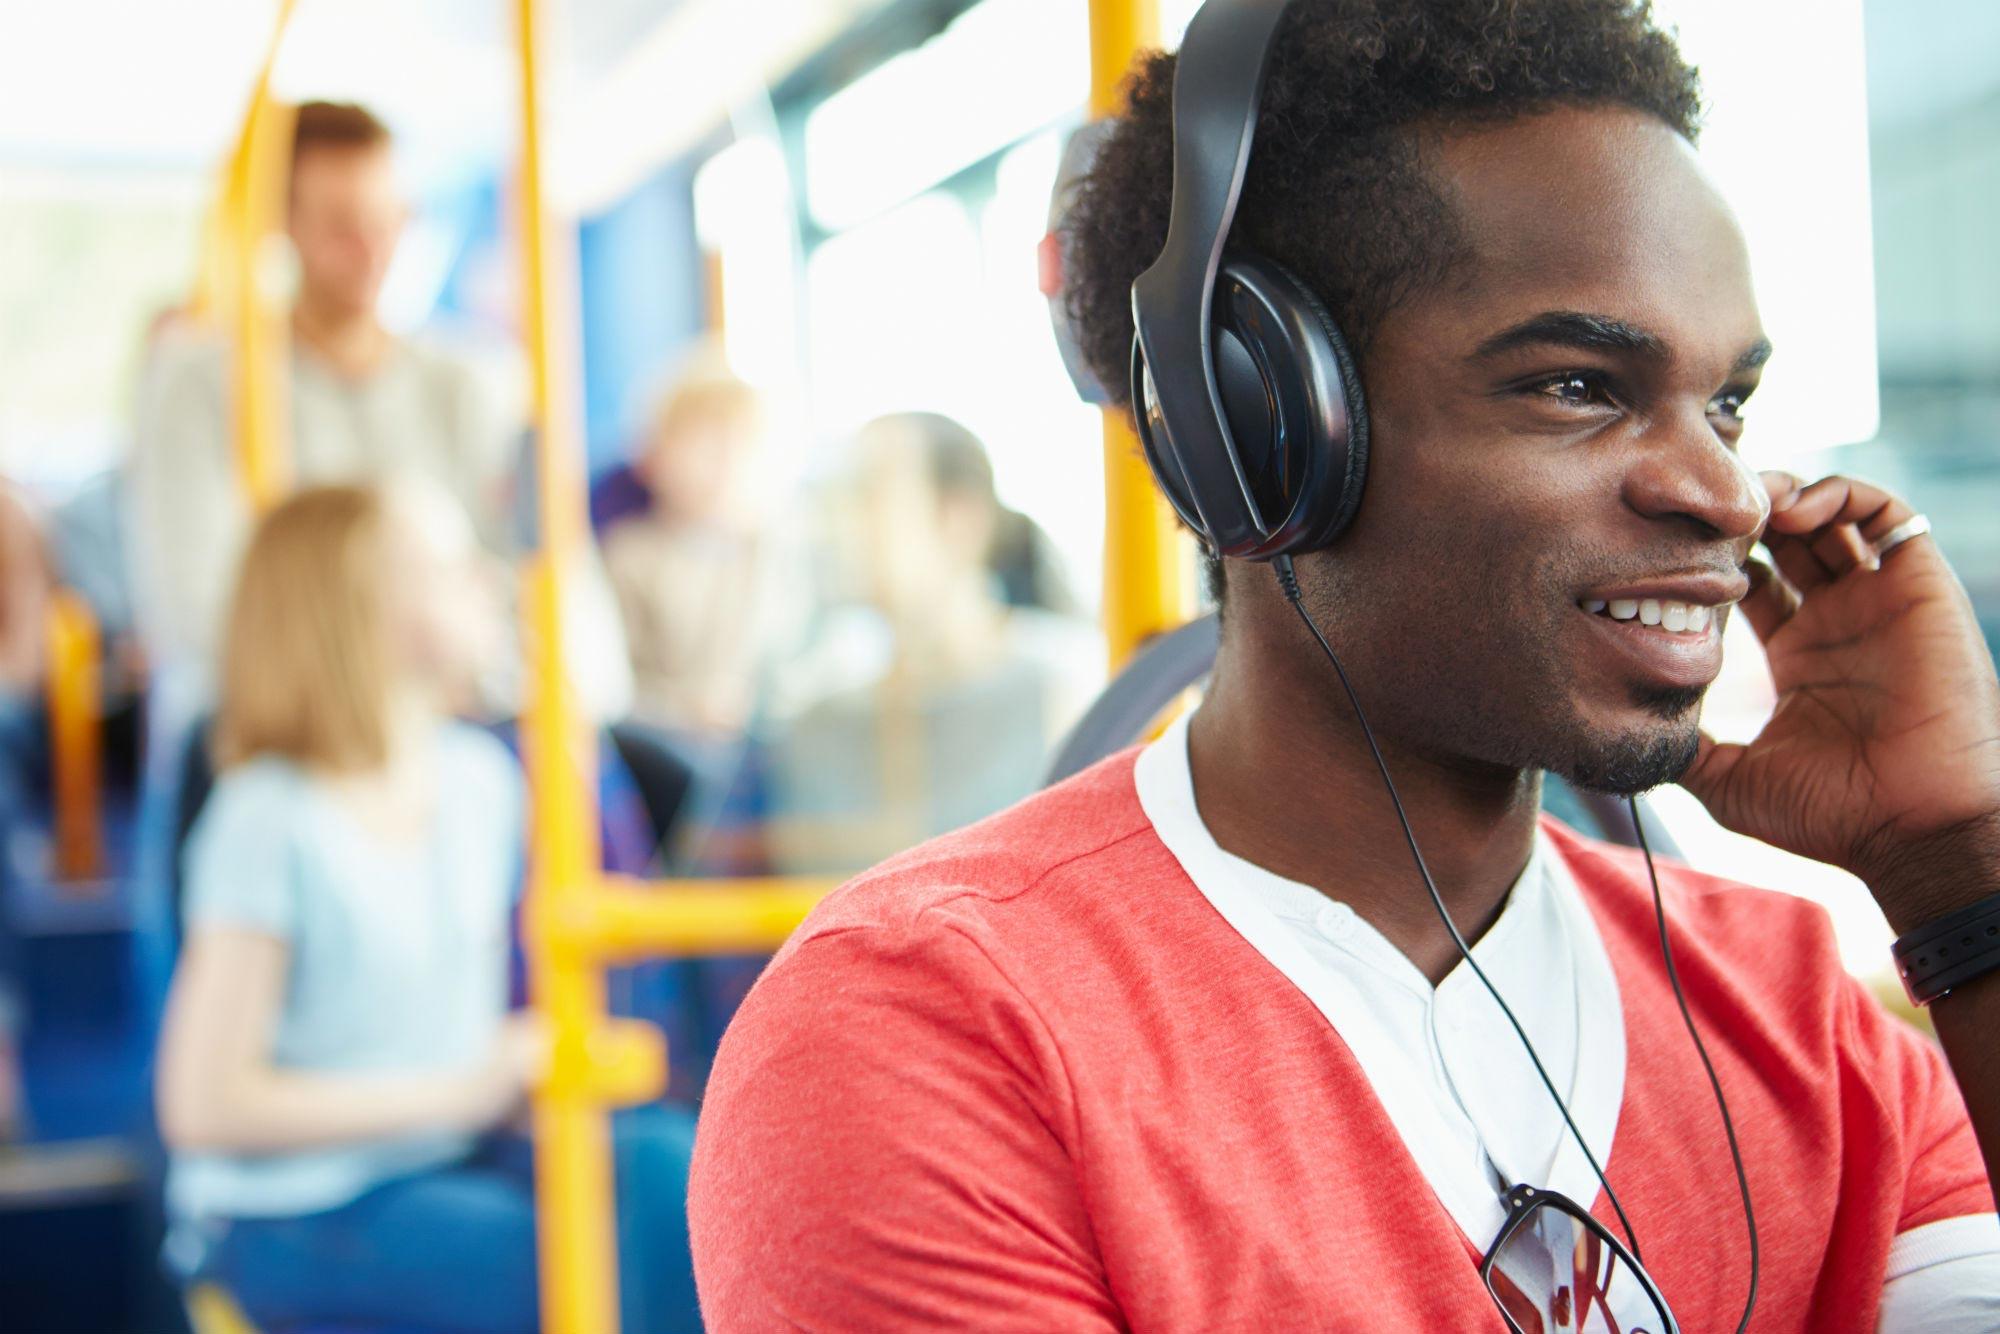 uso-fones-perda-auditiva